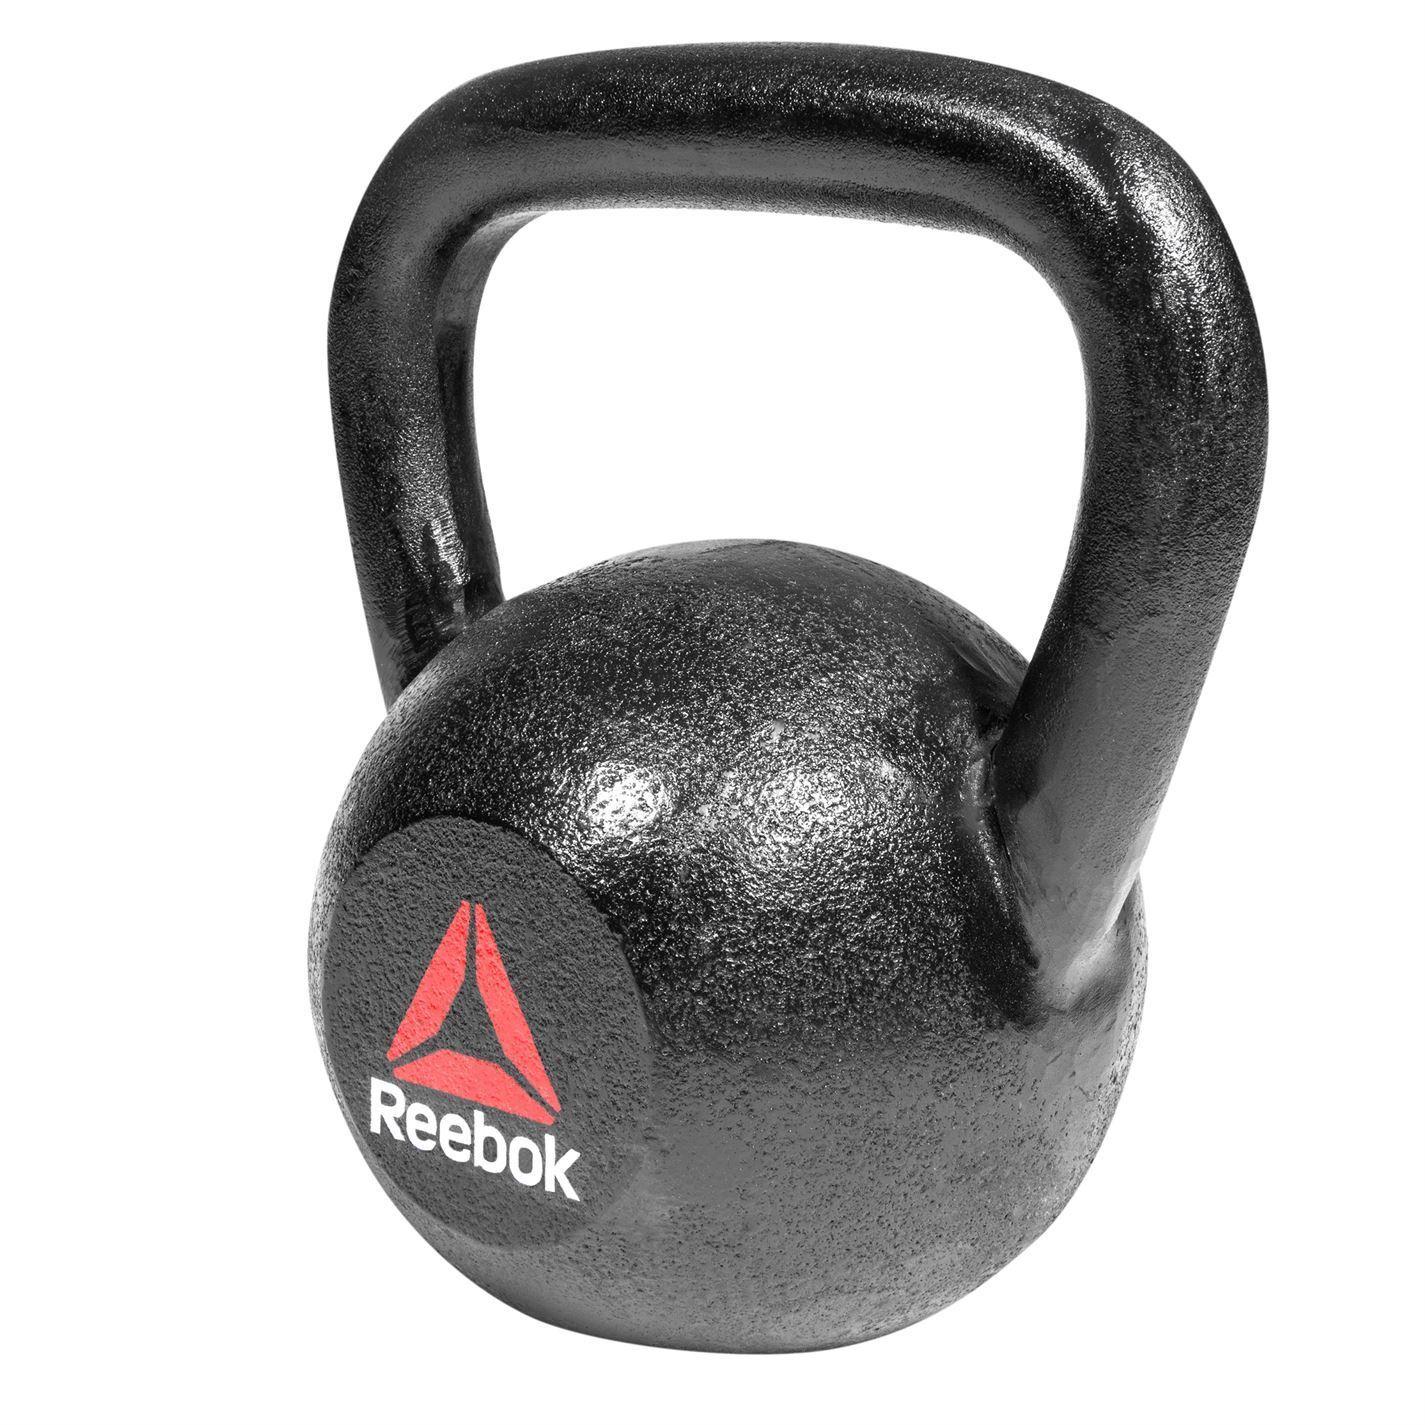 Reebok 24kg Cast Iron Kettlebell Fitness Gym Training Weightlifting Weightlifting Weightlifting Bodybuilding 68664f